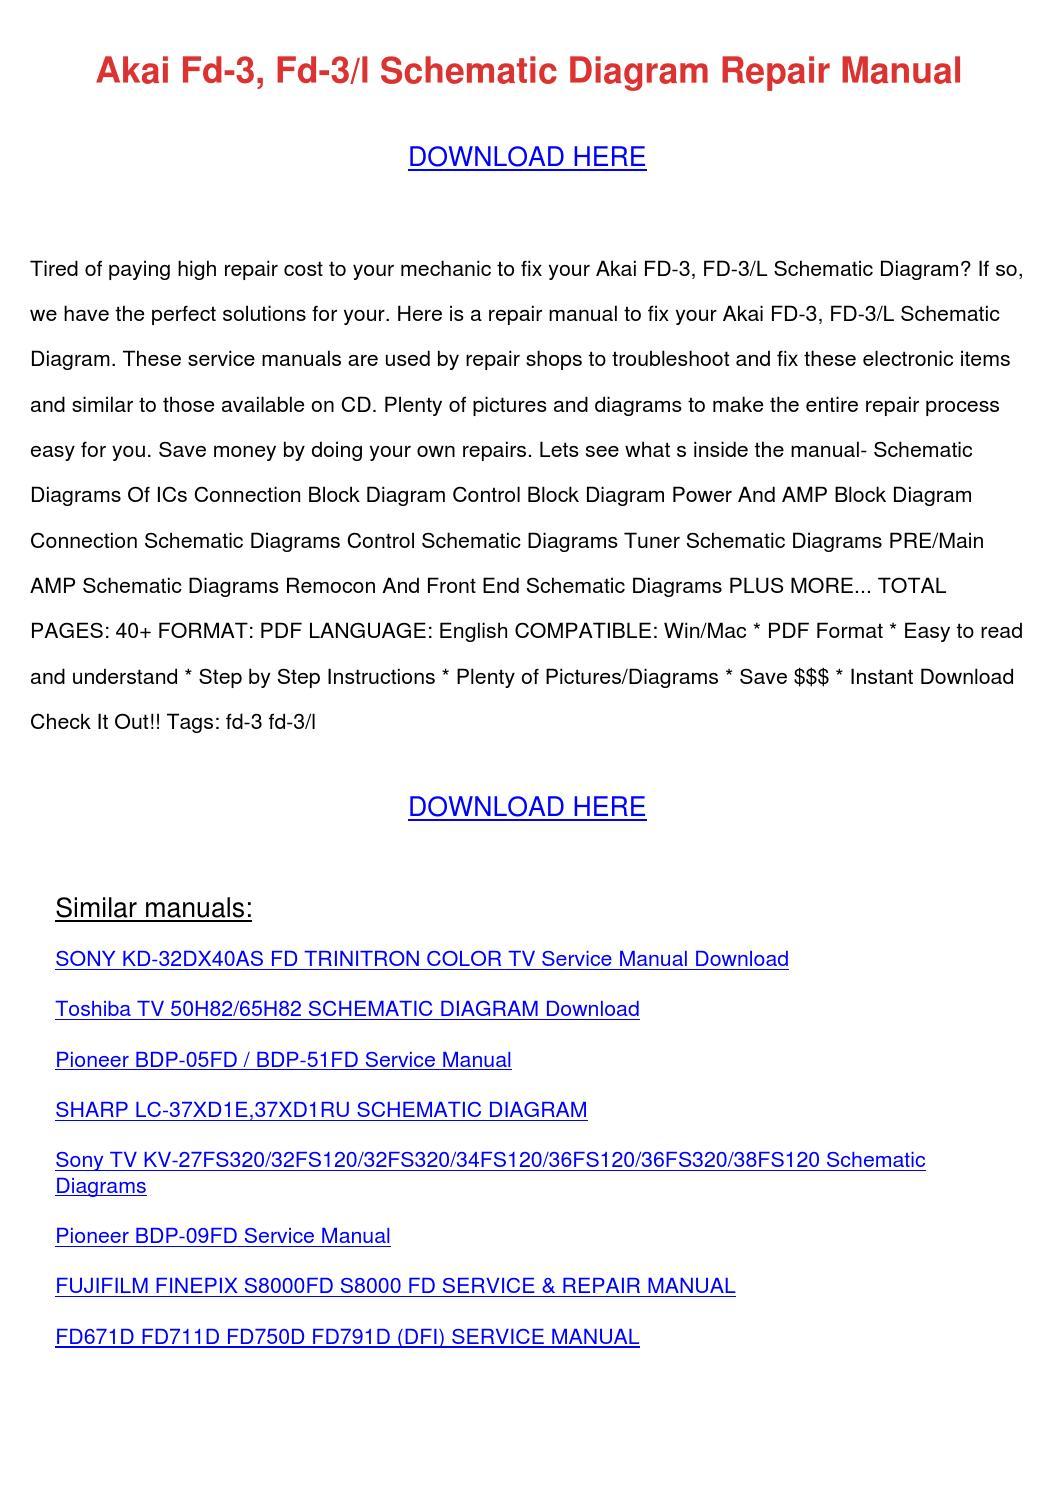 ... Array - akai fd 3 fd 3l schematic diagram repair manu by  kristoferkeeney issuu rh issuu ...